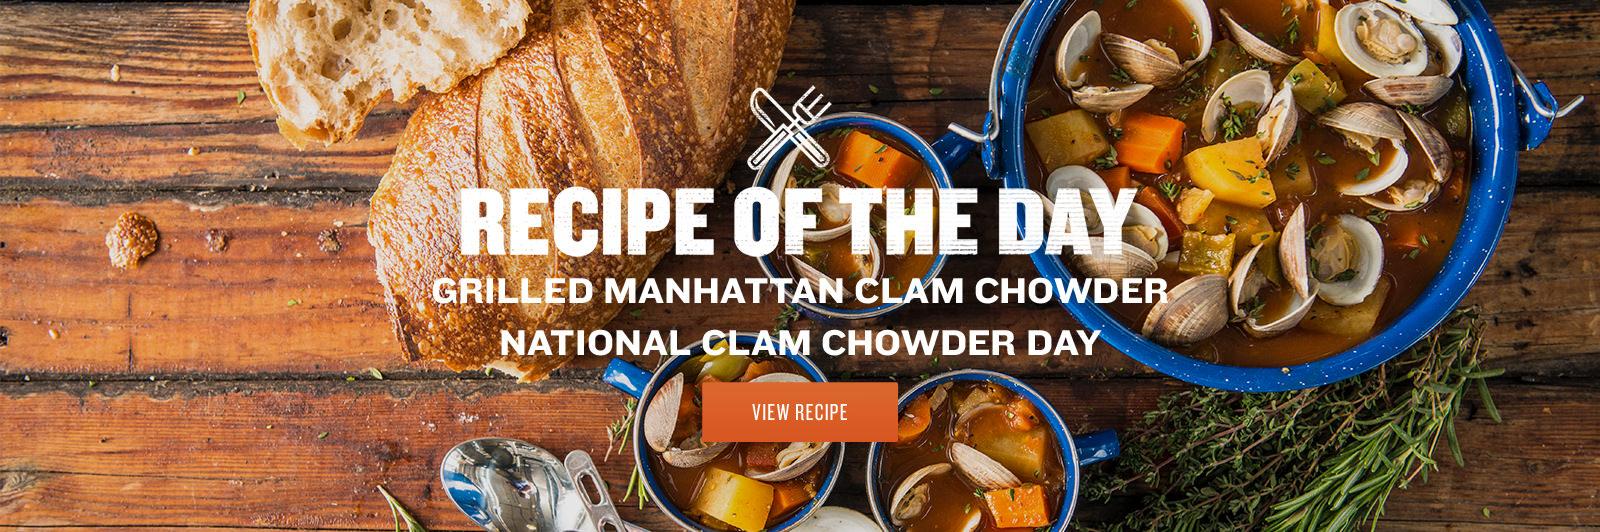 Grilled Manhattan Clam Chowder